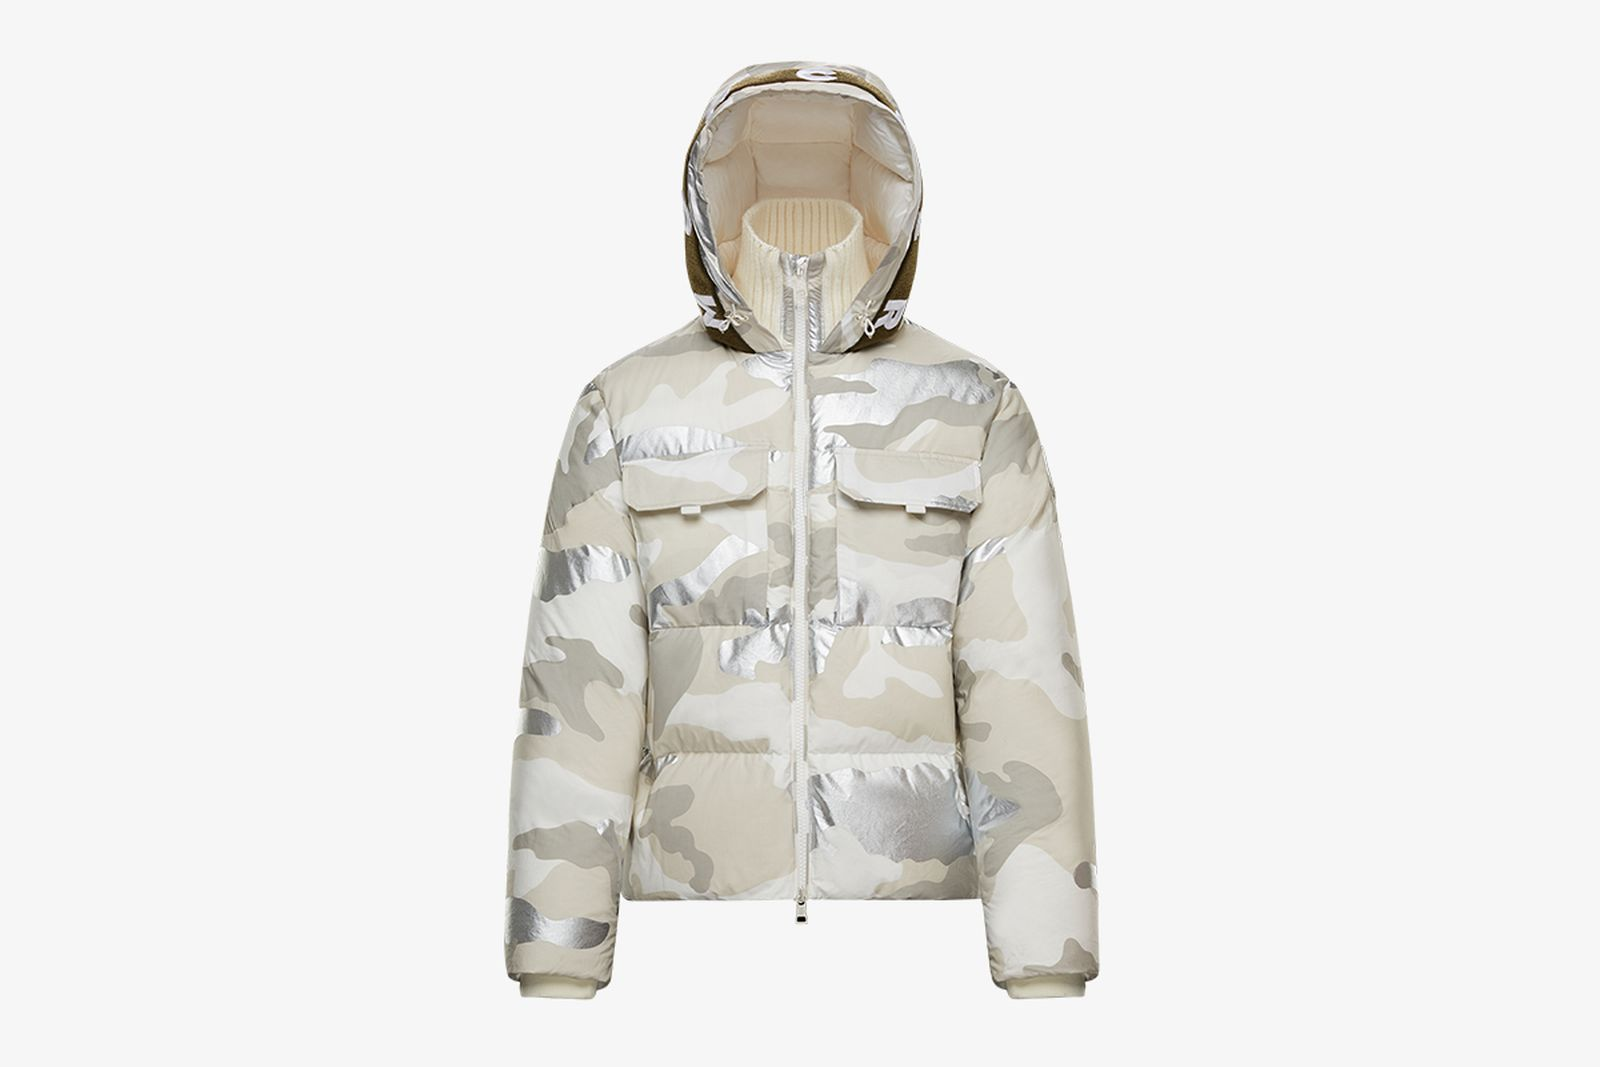 moncler-tackling-tundra-collection-04